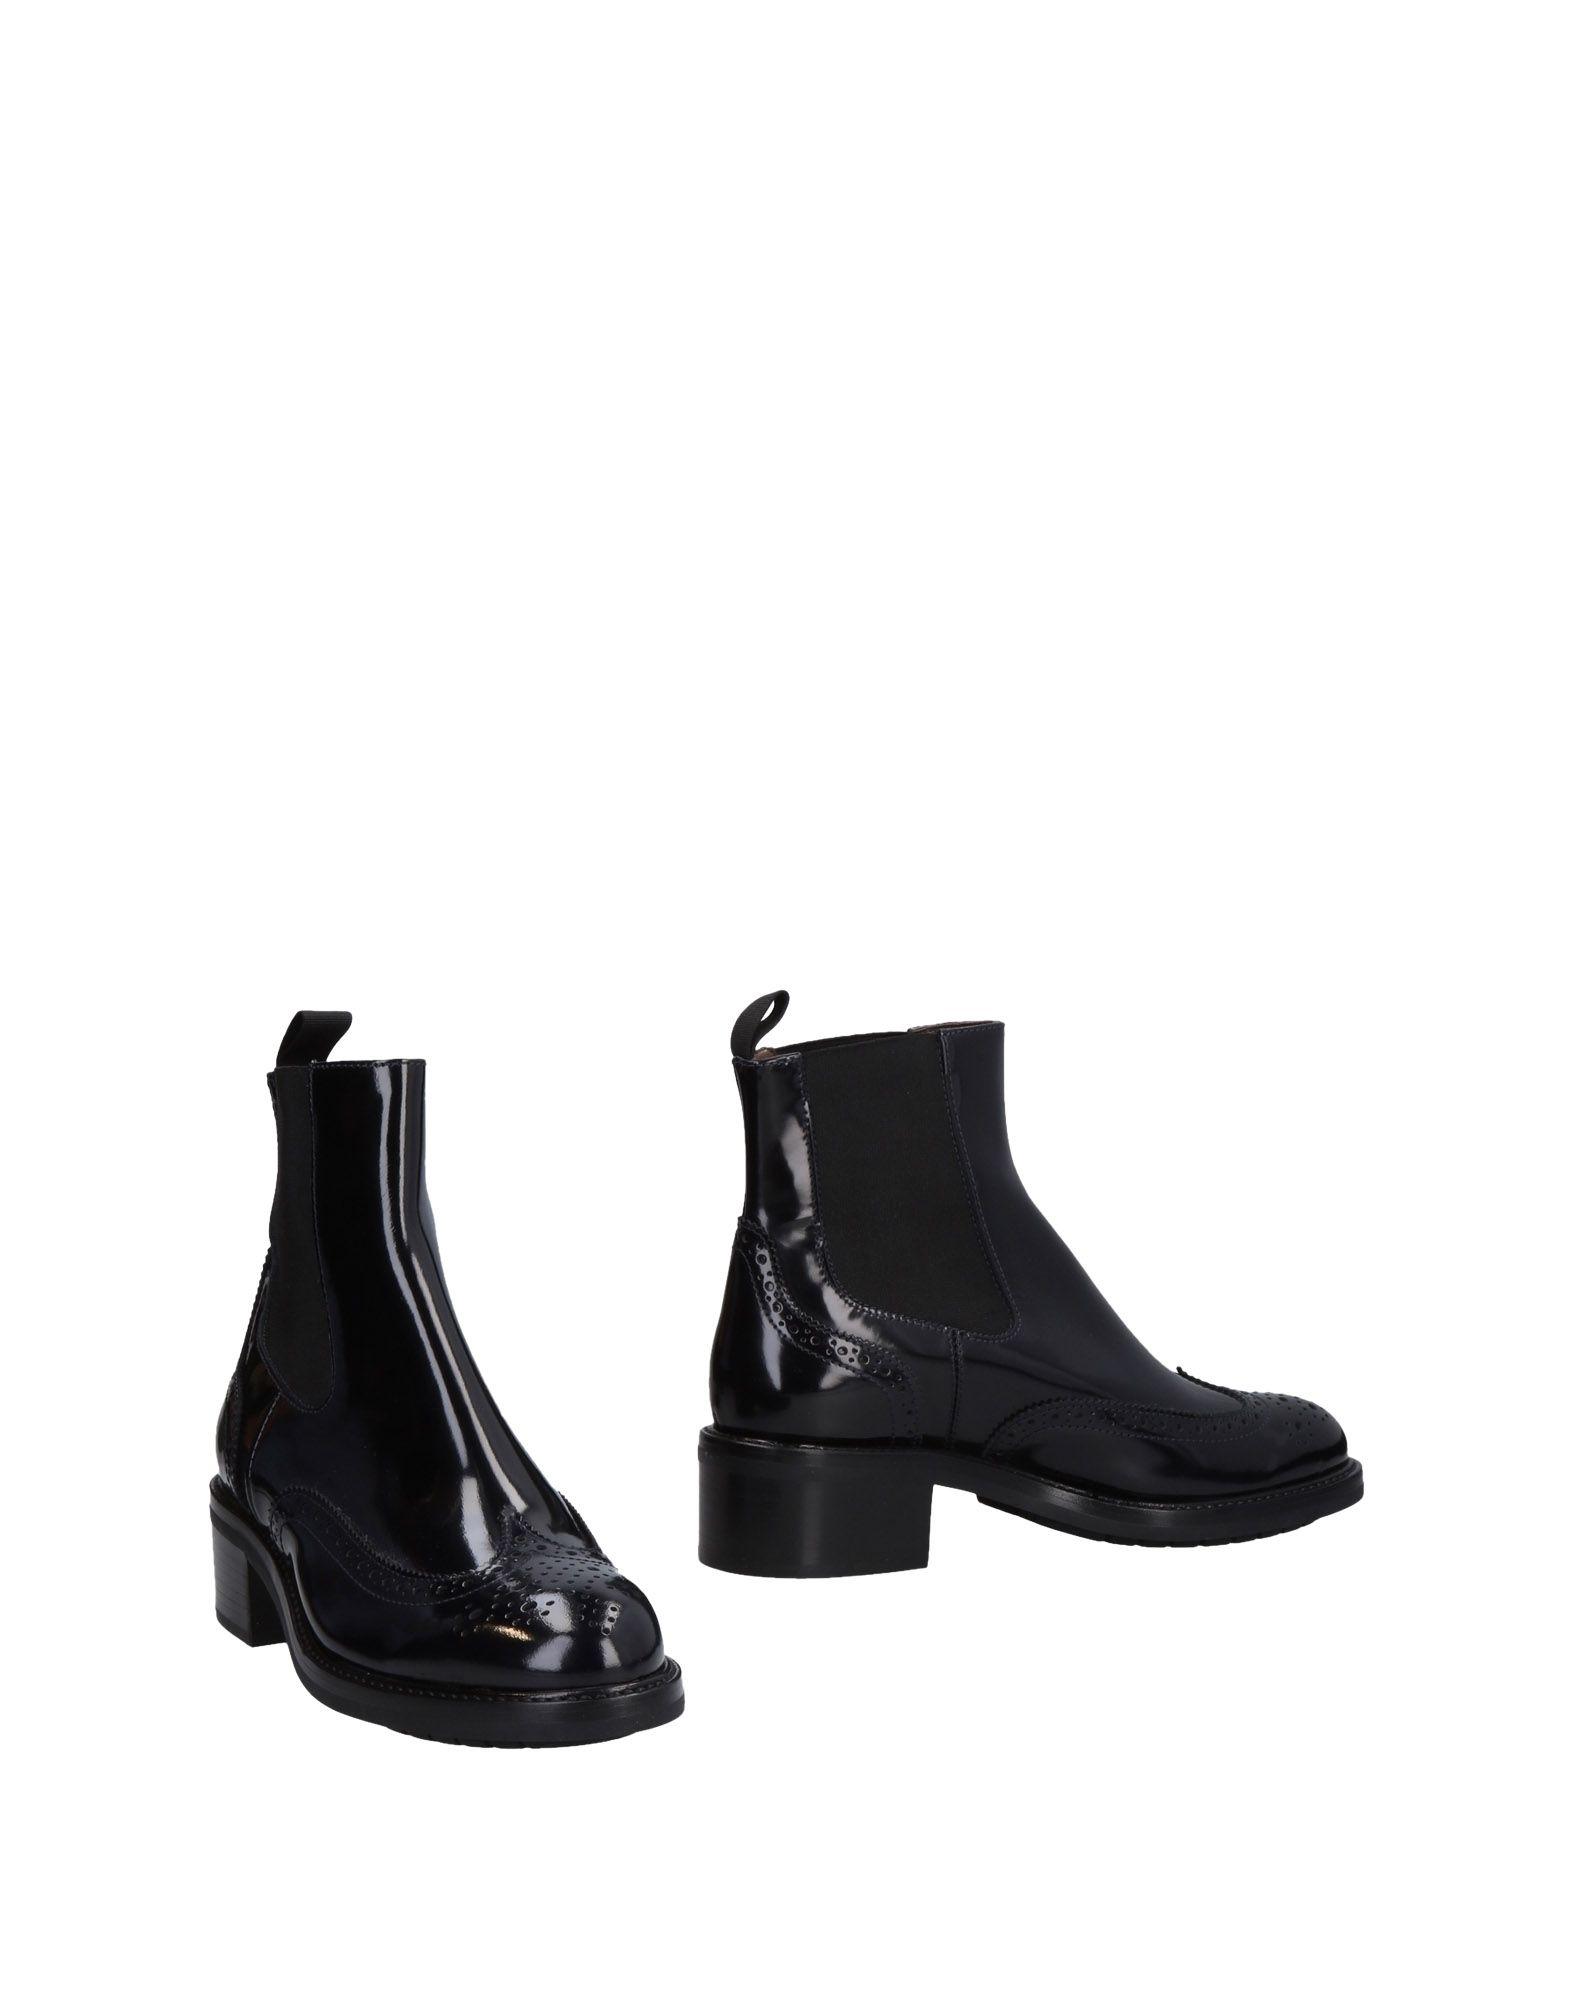 Agl Damen Attilio Giusti Leombruni Chelsea Boots Damen Agl  11470171HKGut aussehende strapazierfähige Schuhe 022201